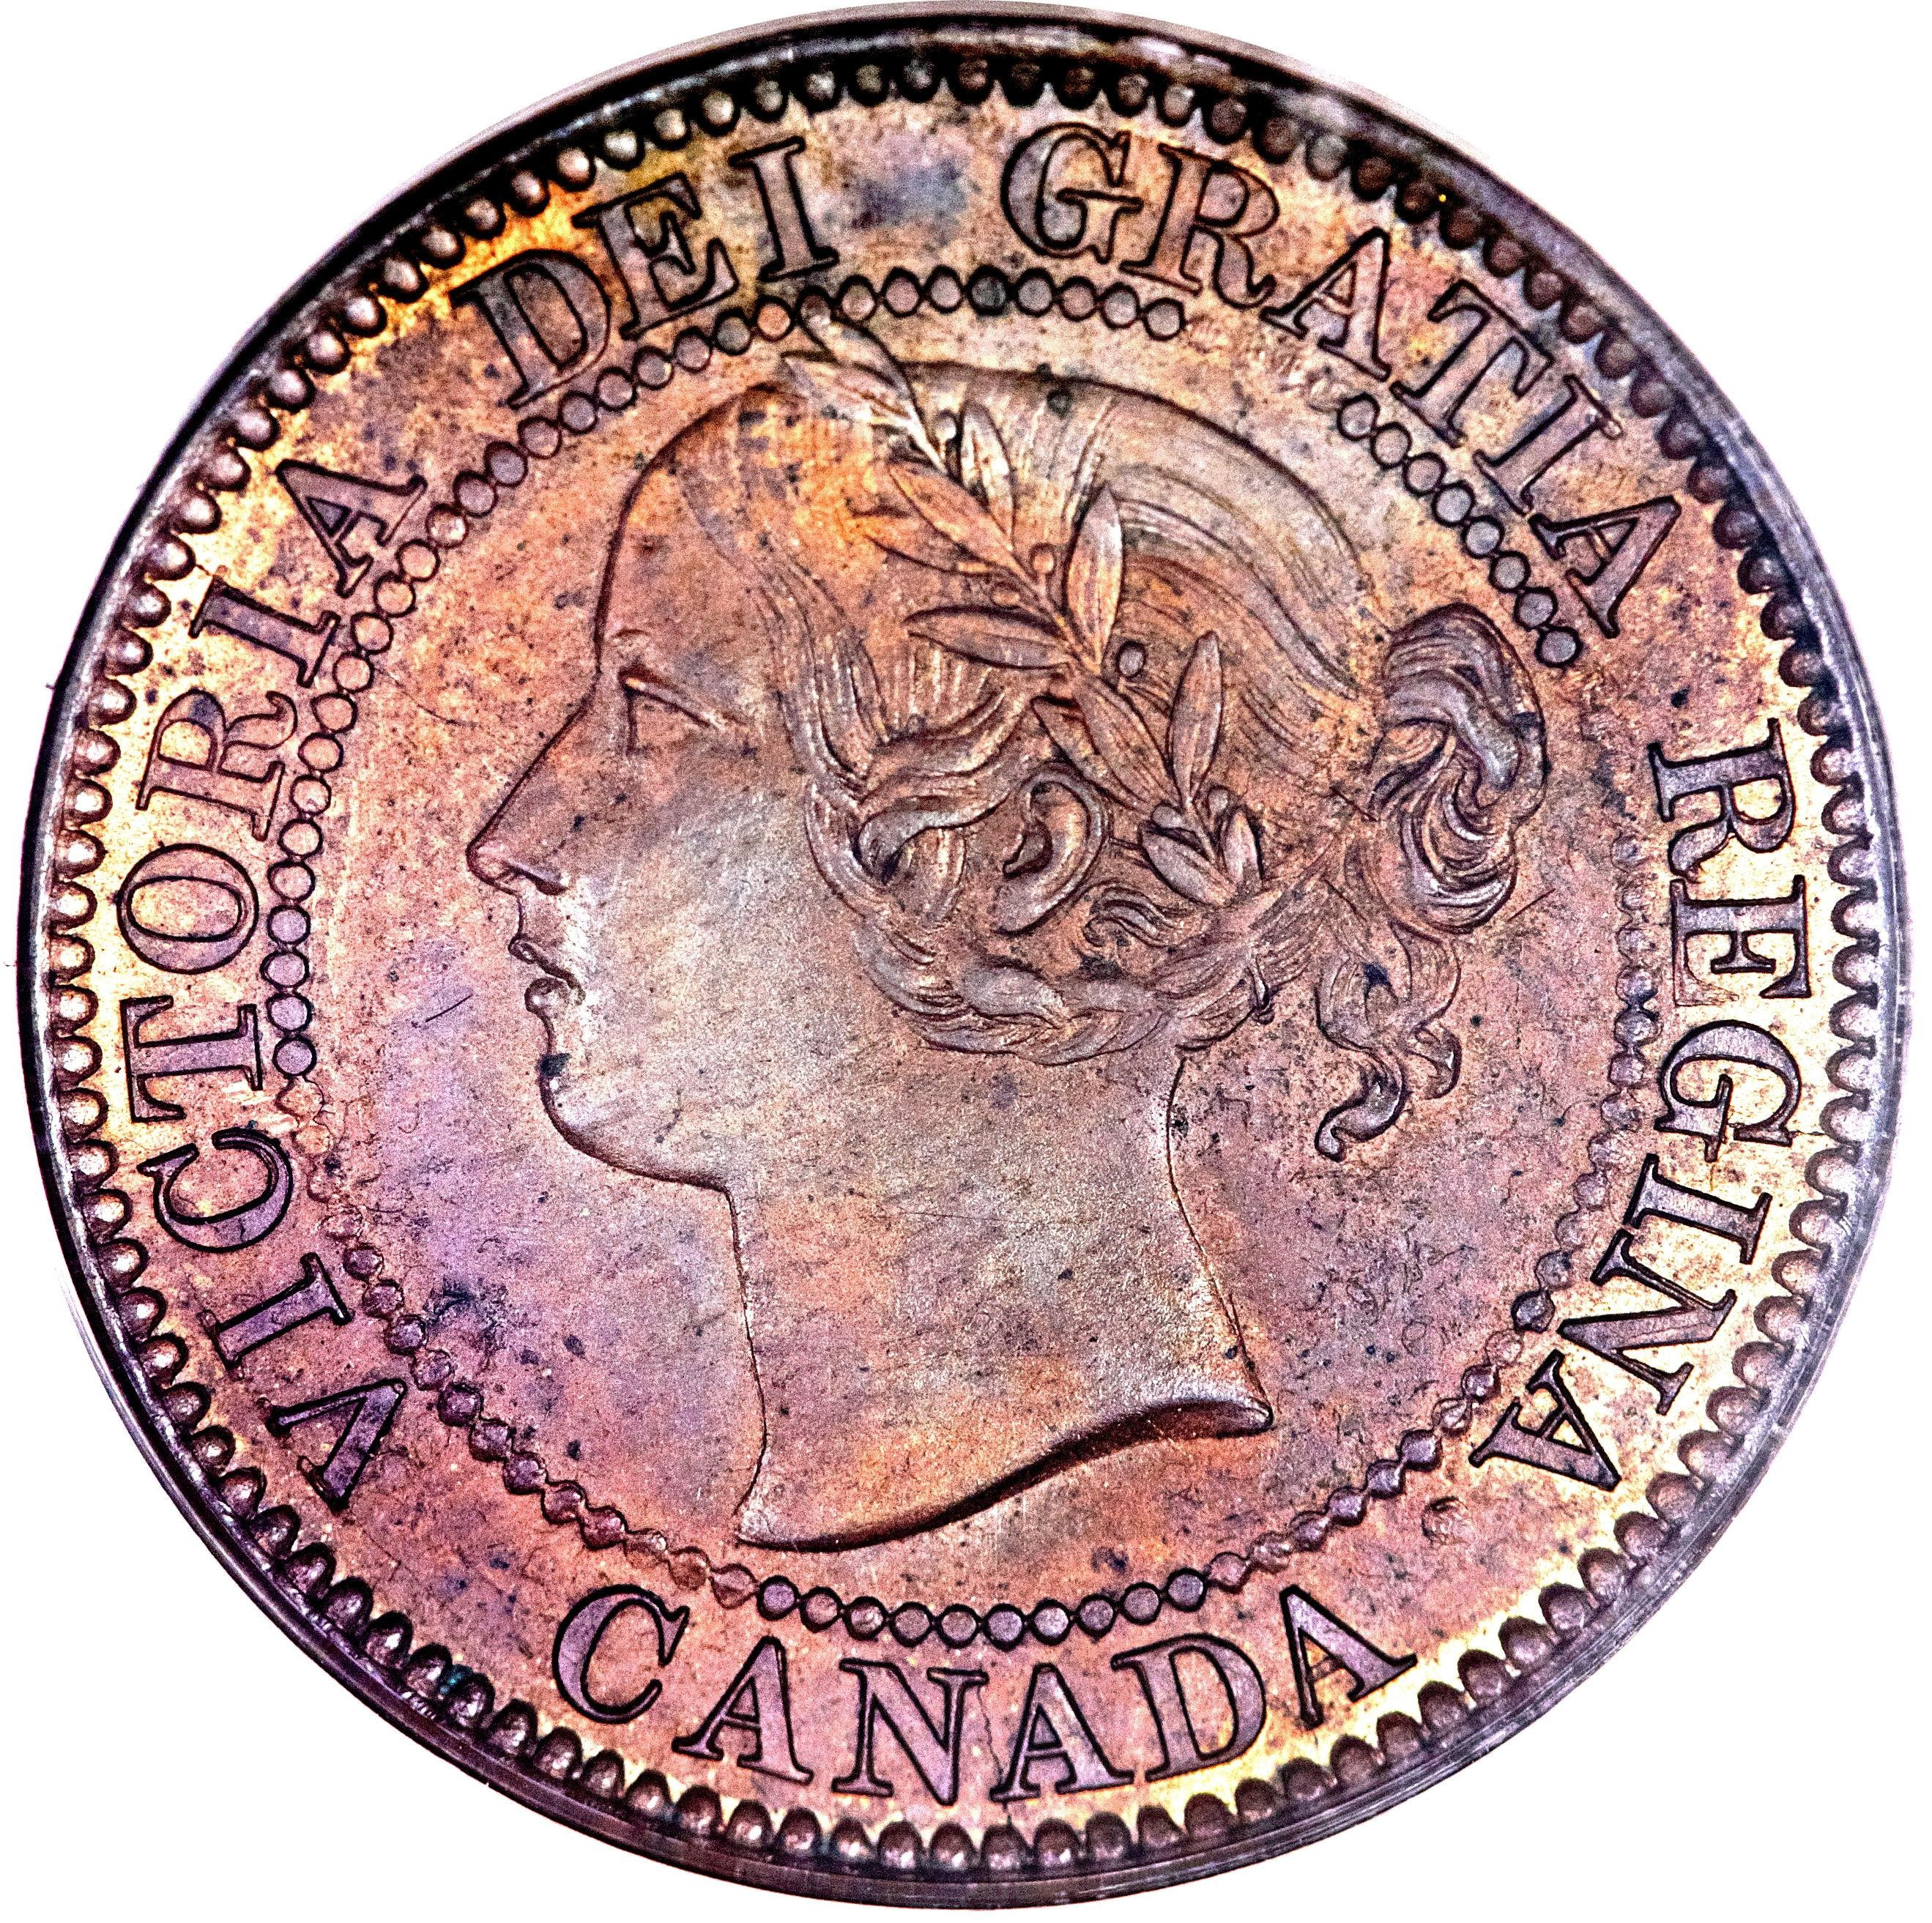 Canada 1 Cent (Victoria)